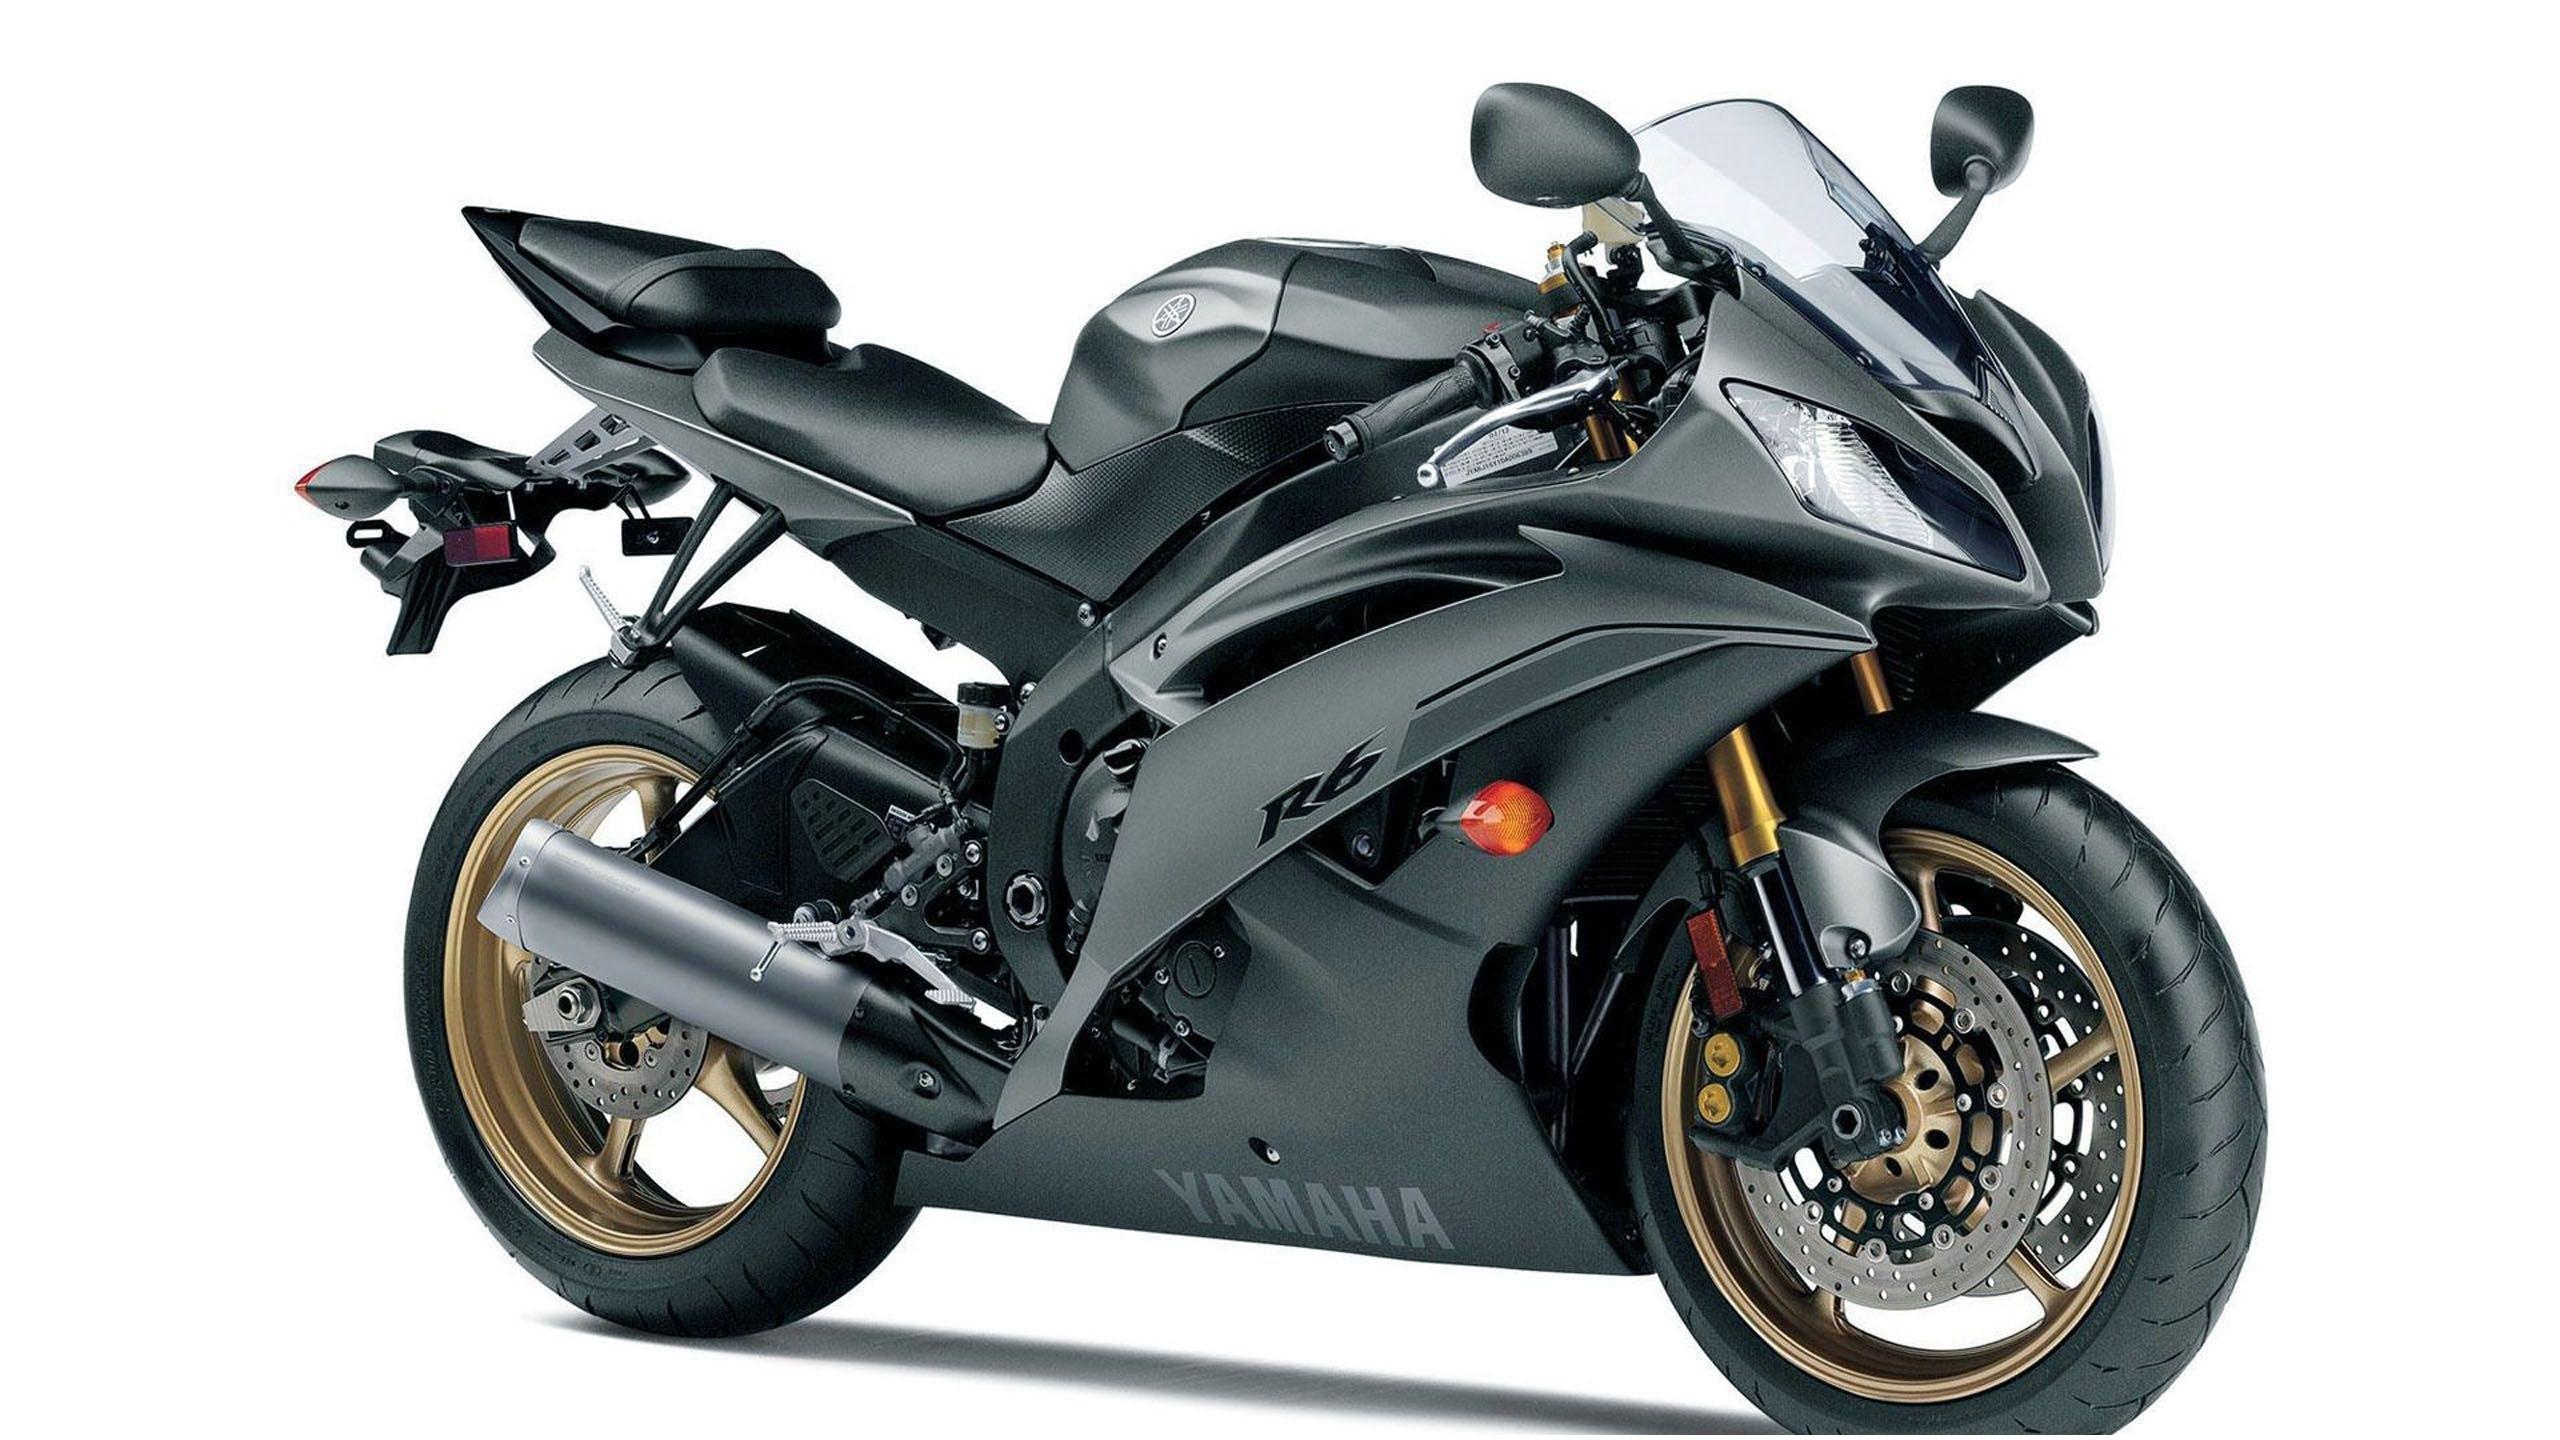 Yamaha YZF-R6 Sport Bike Motorcycle Desktop Wallpaper